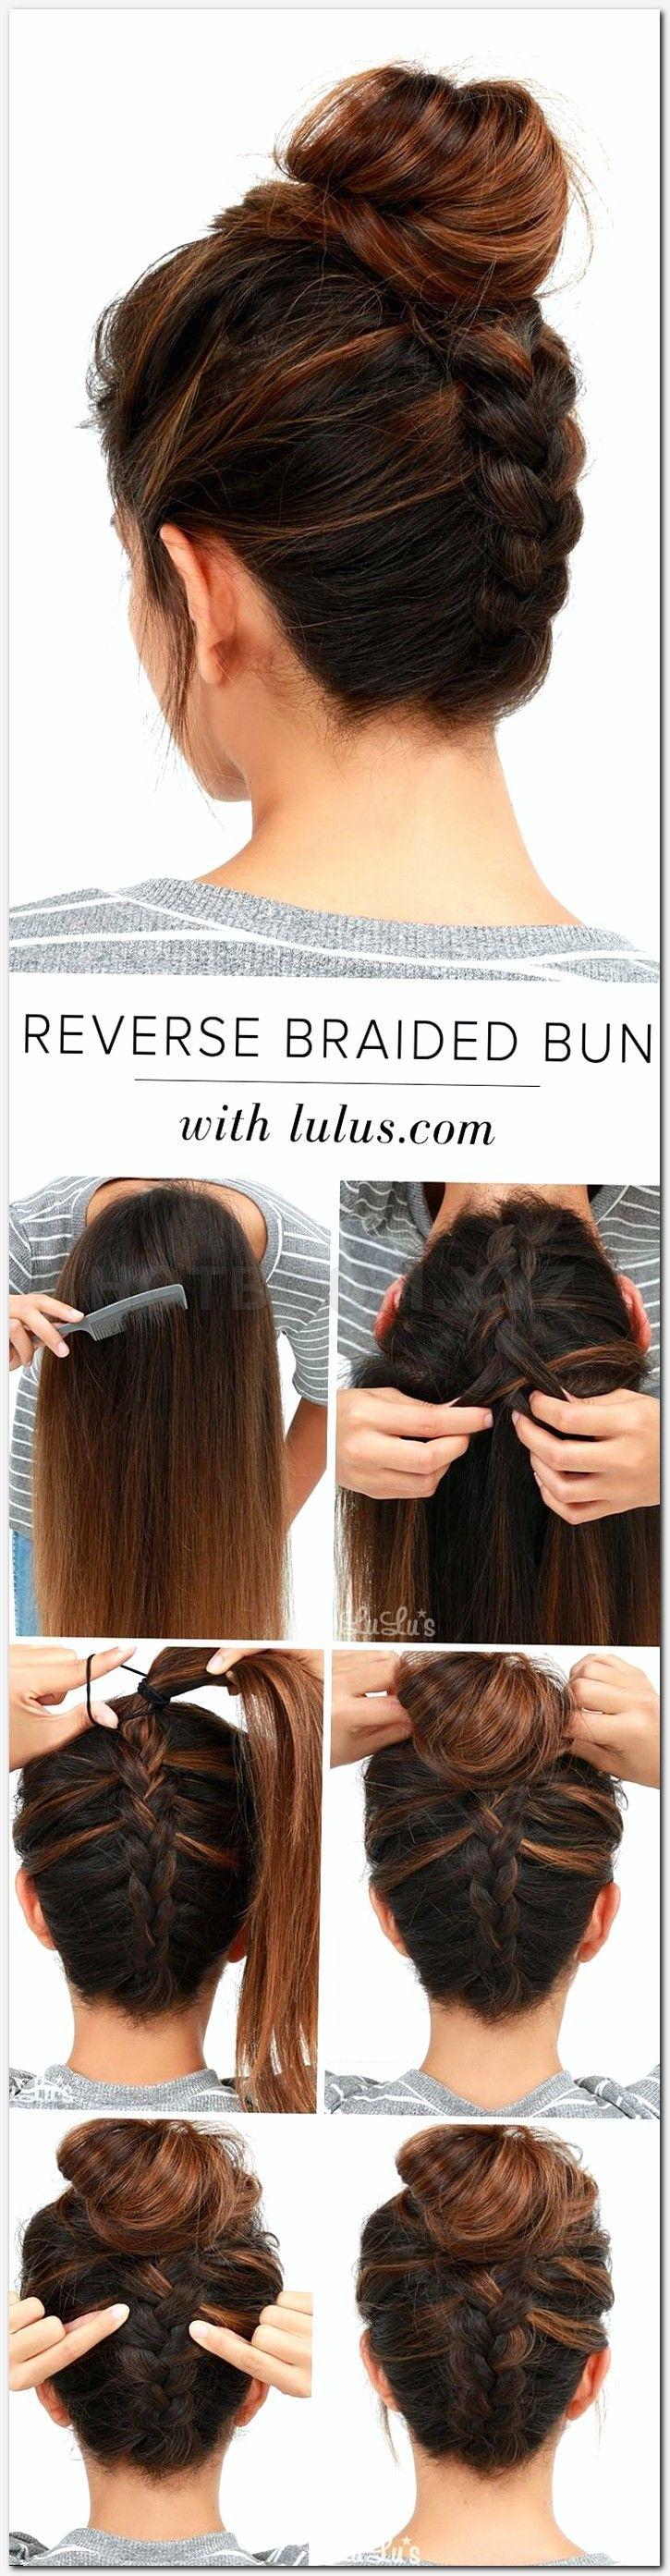 1643 best medium hair images on Pinterest